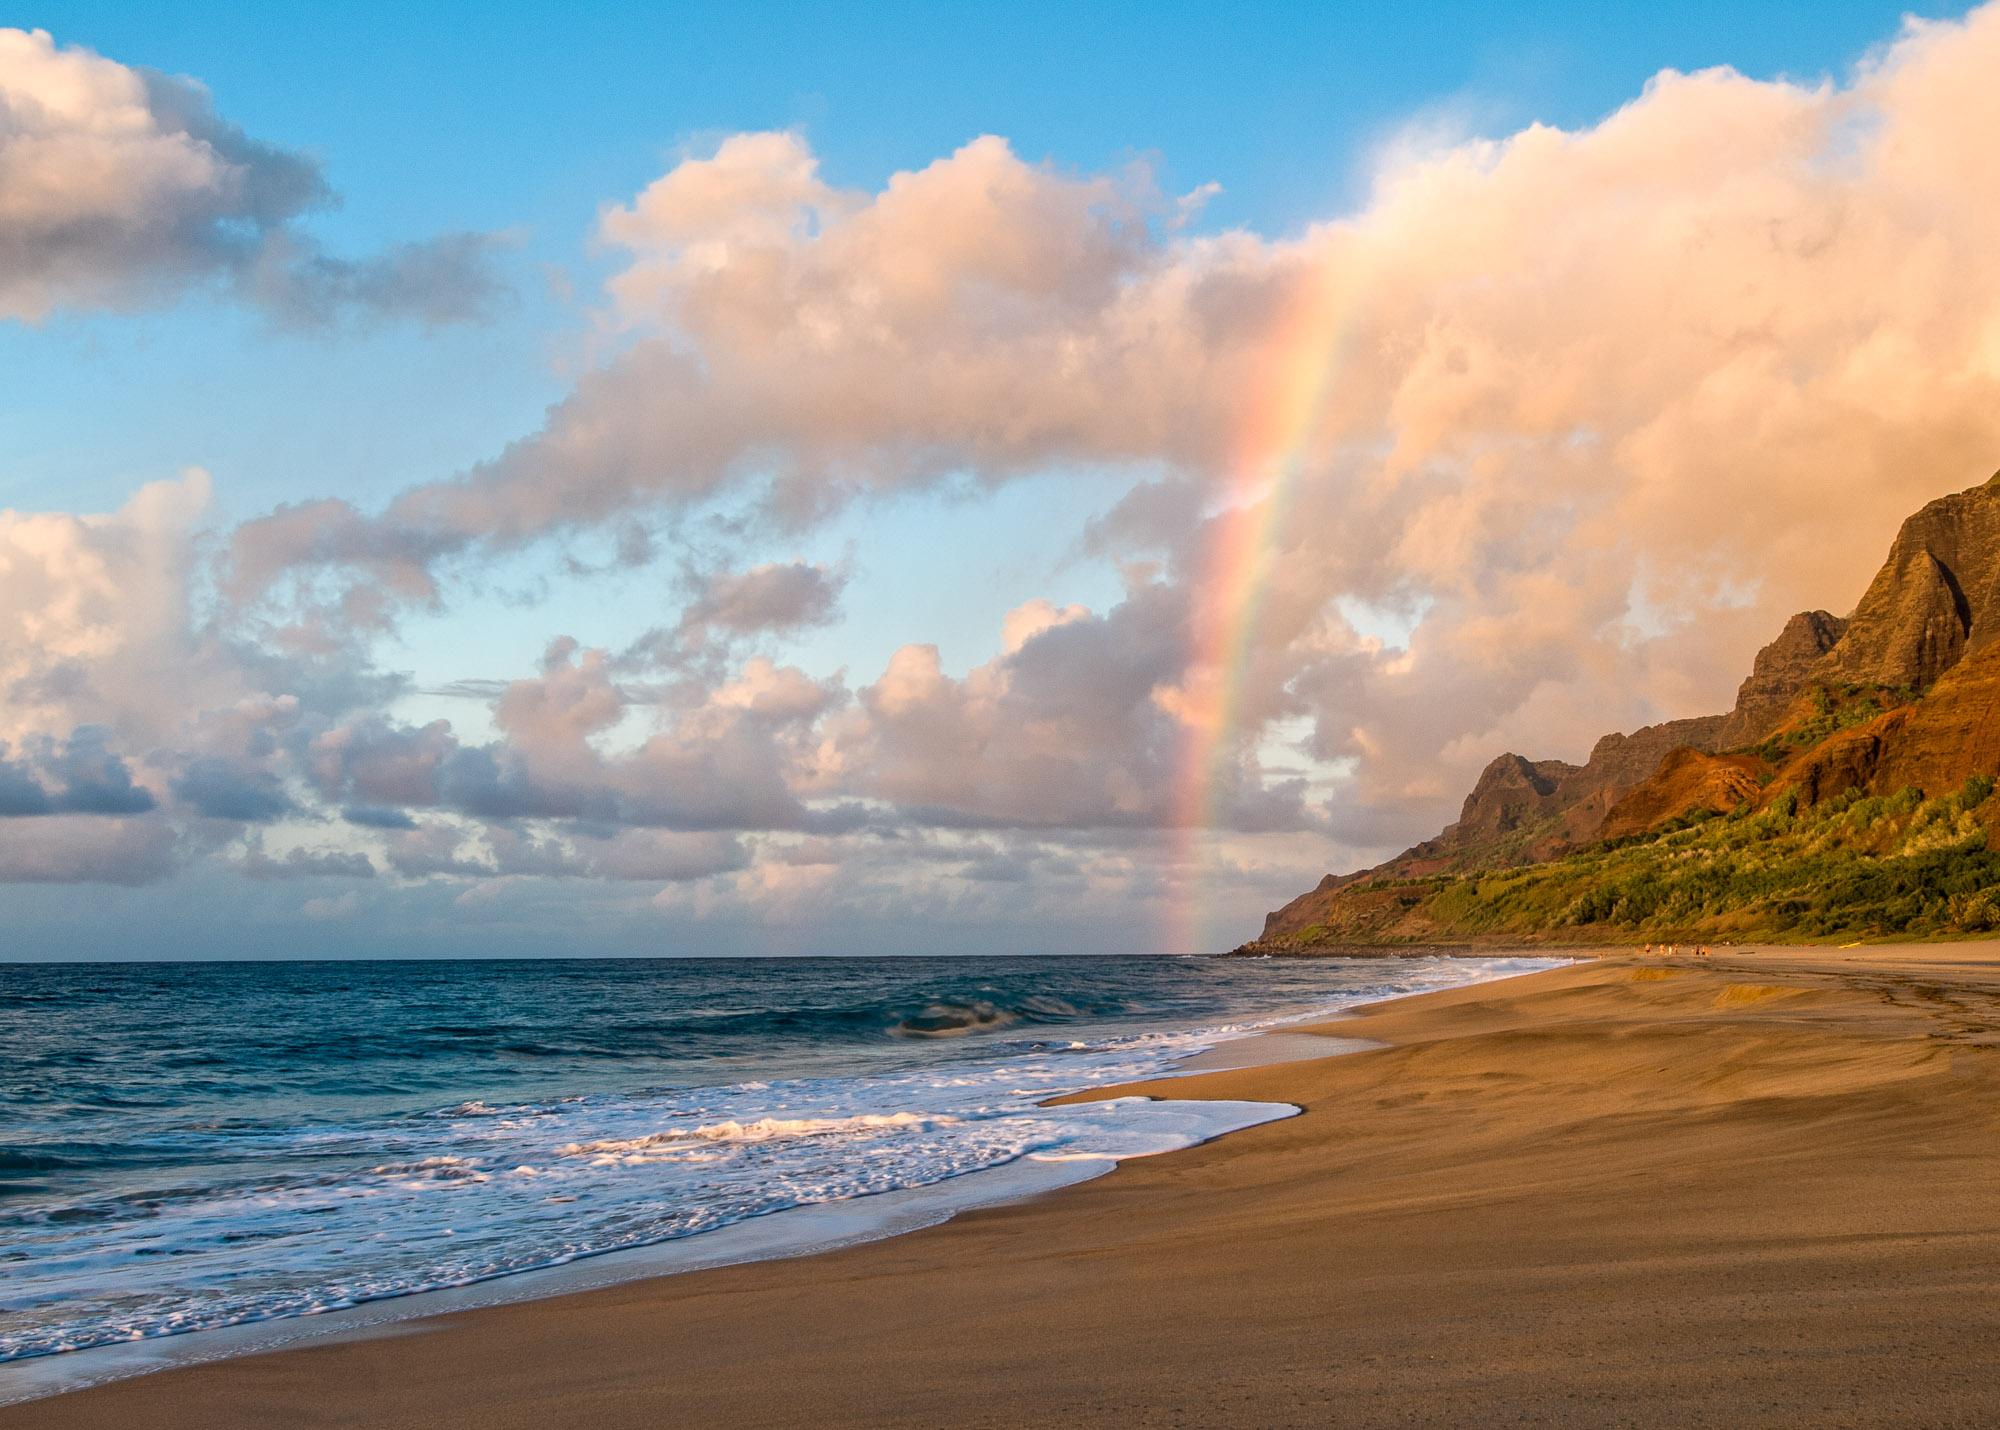 Kalalau Beach, Kauai (Nikon D200)